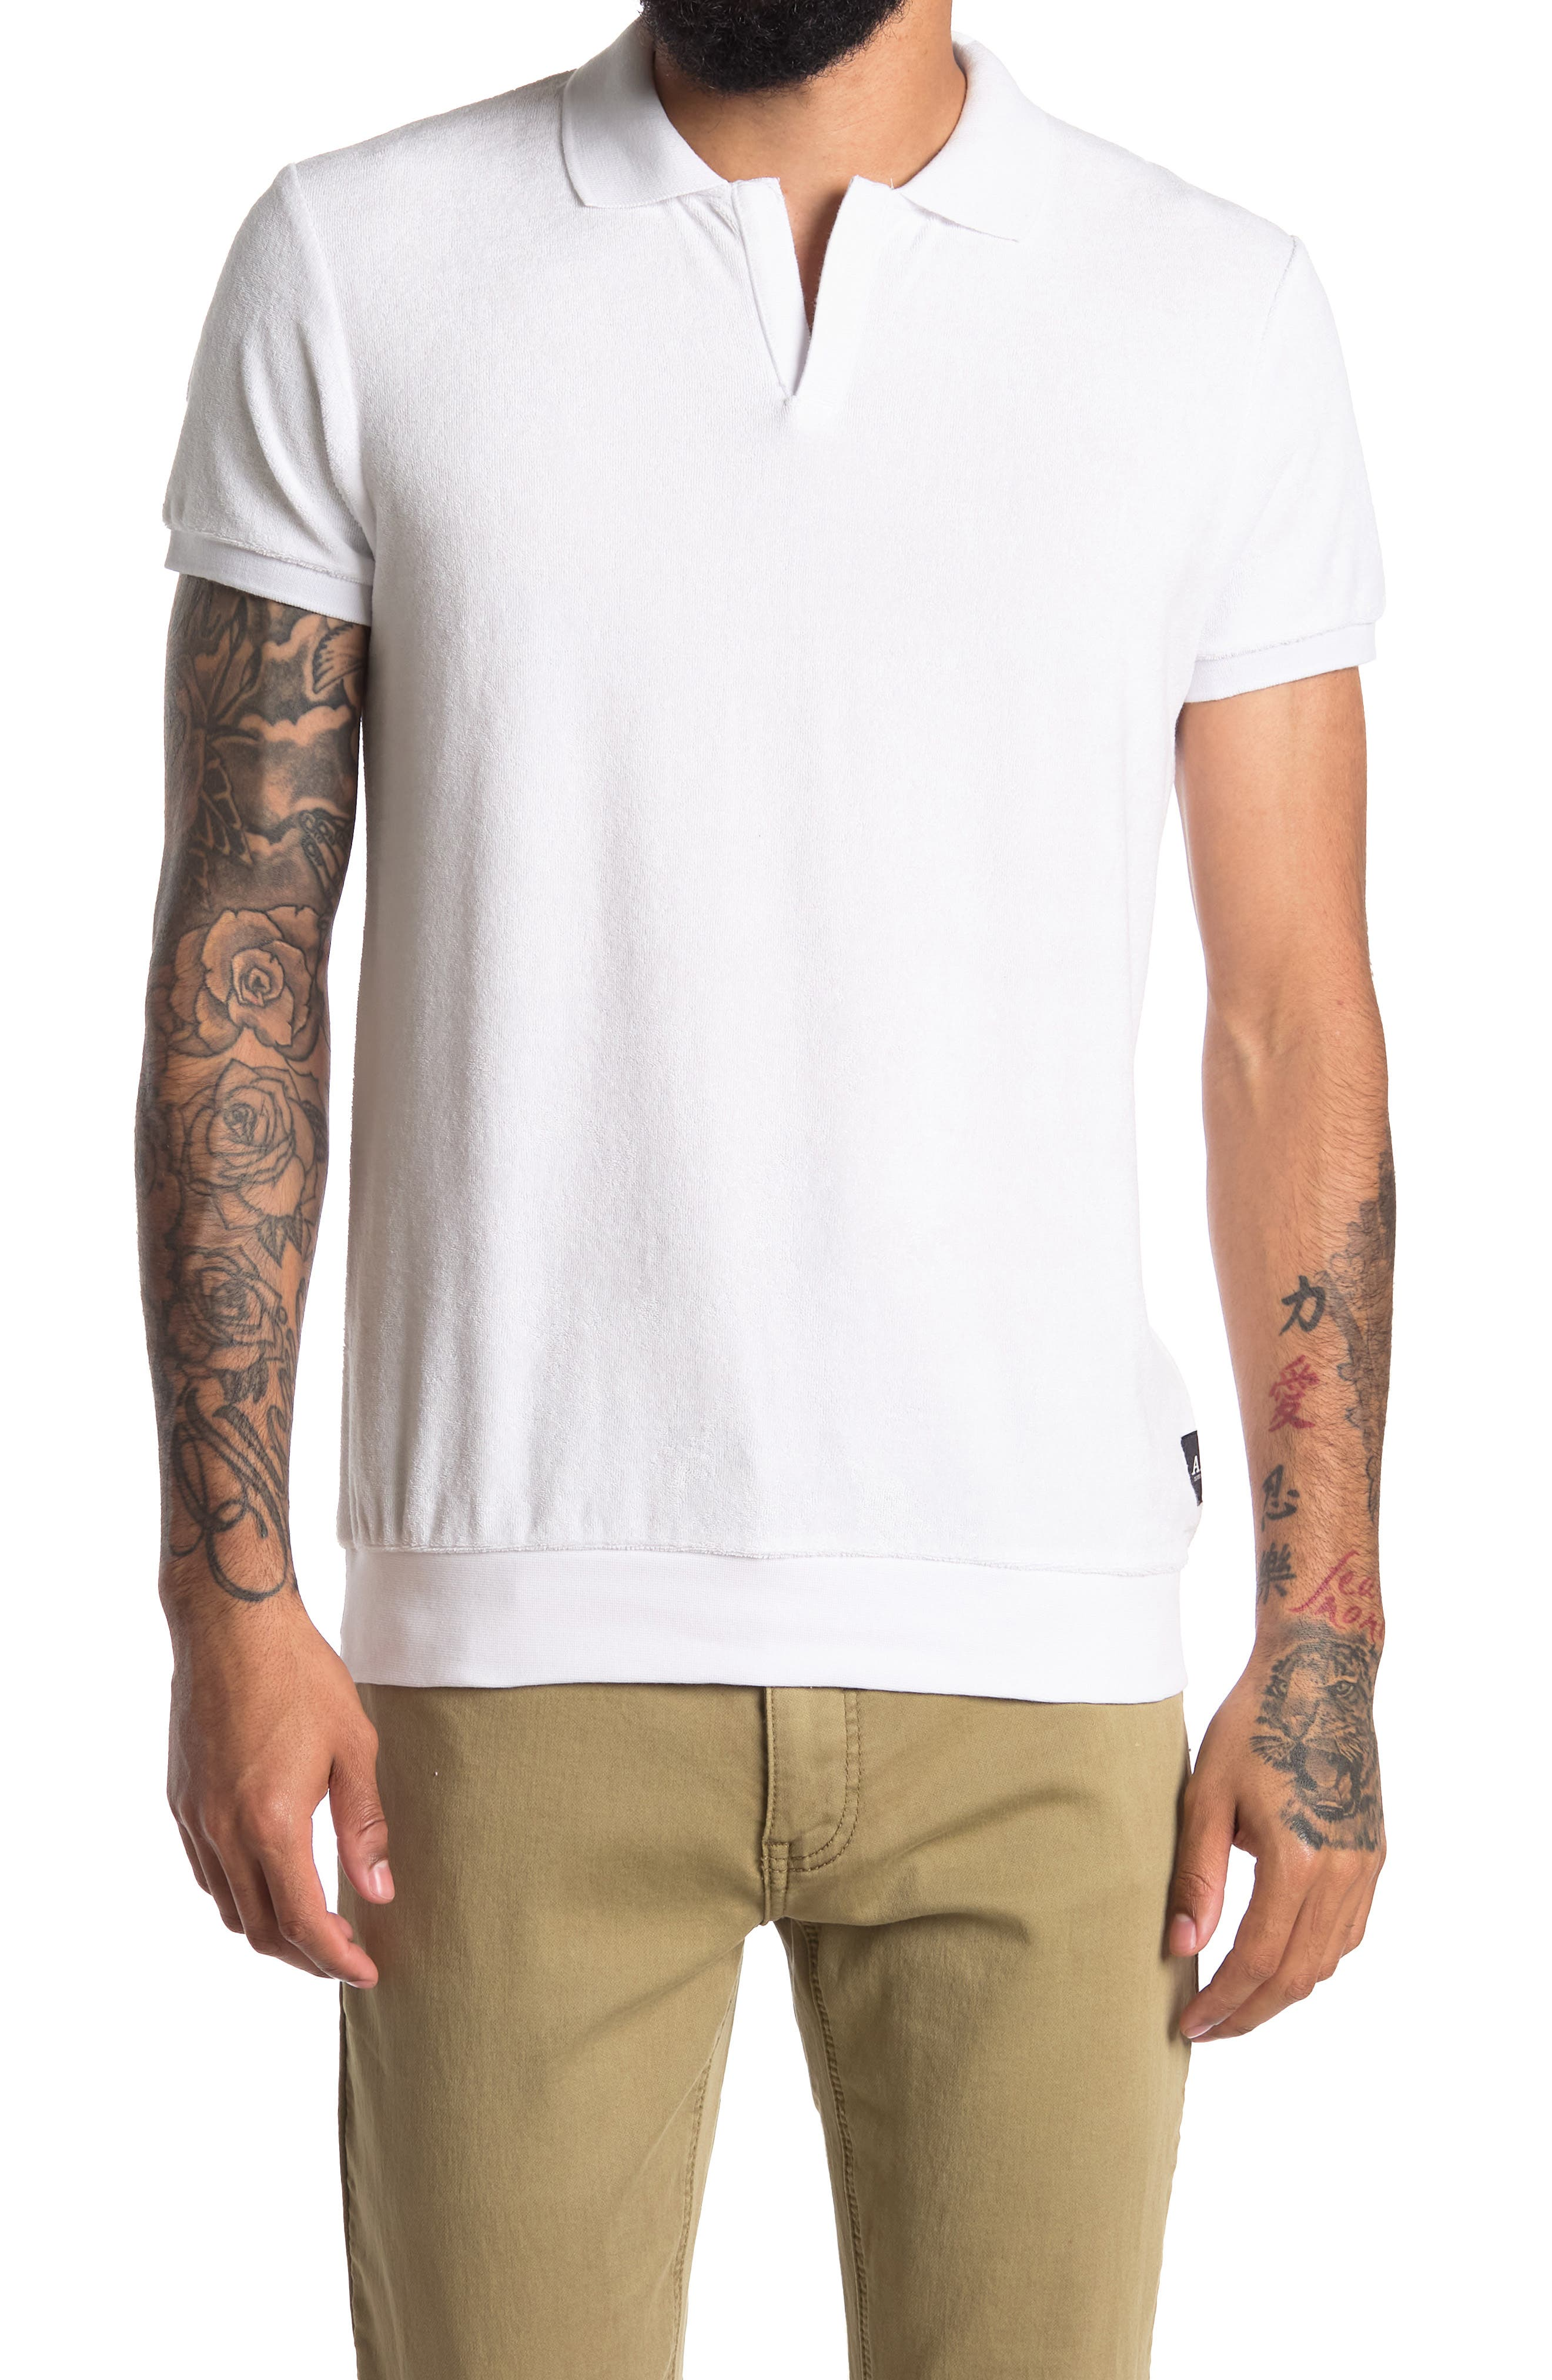 1930s Mens Shirts | Dress Shirts, Polo Shirts, Work Shirts Scotch  Soda Cotton Terry Beach Polo Size M - 0102-Denim White at Nordstrom Rack $34.97 AT vintagedancer.com